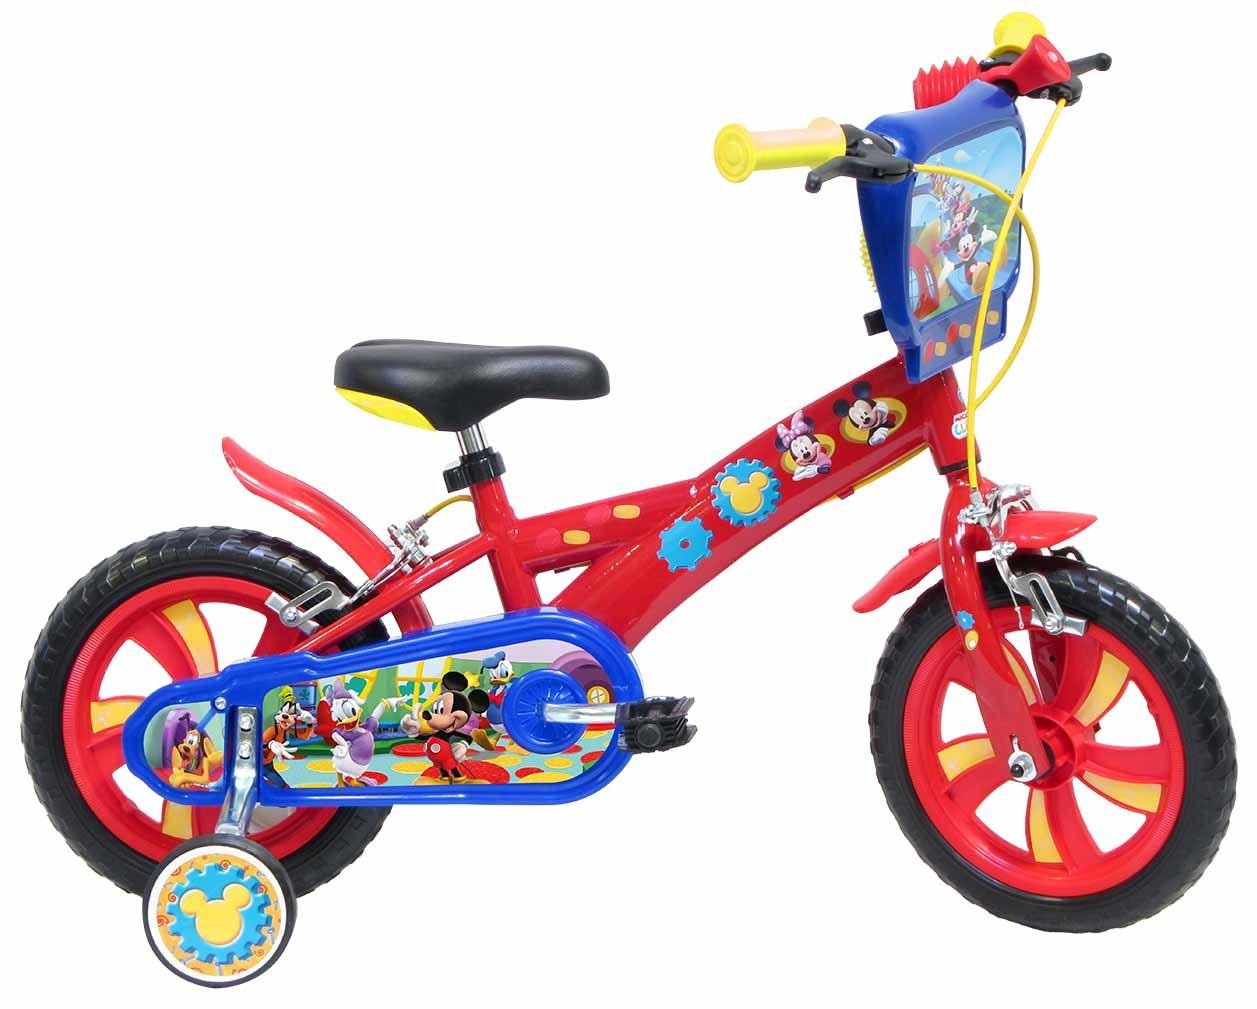 Disney Mickey Mouse - Bicicleta con ruedines DENVER BIKE_13372 Disney^Mickey Mouse